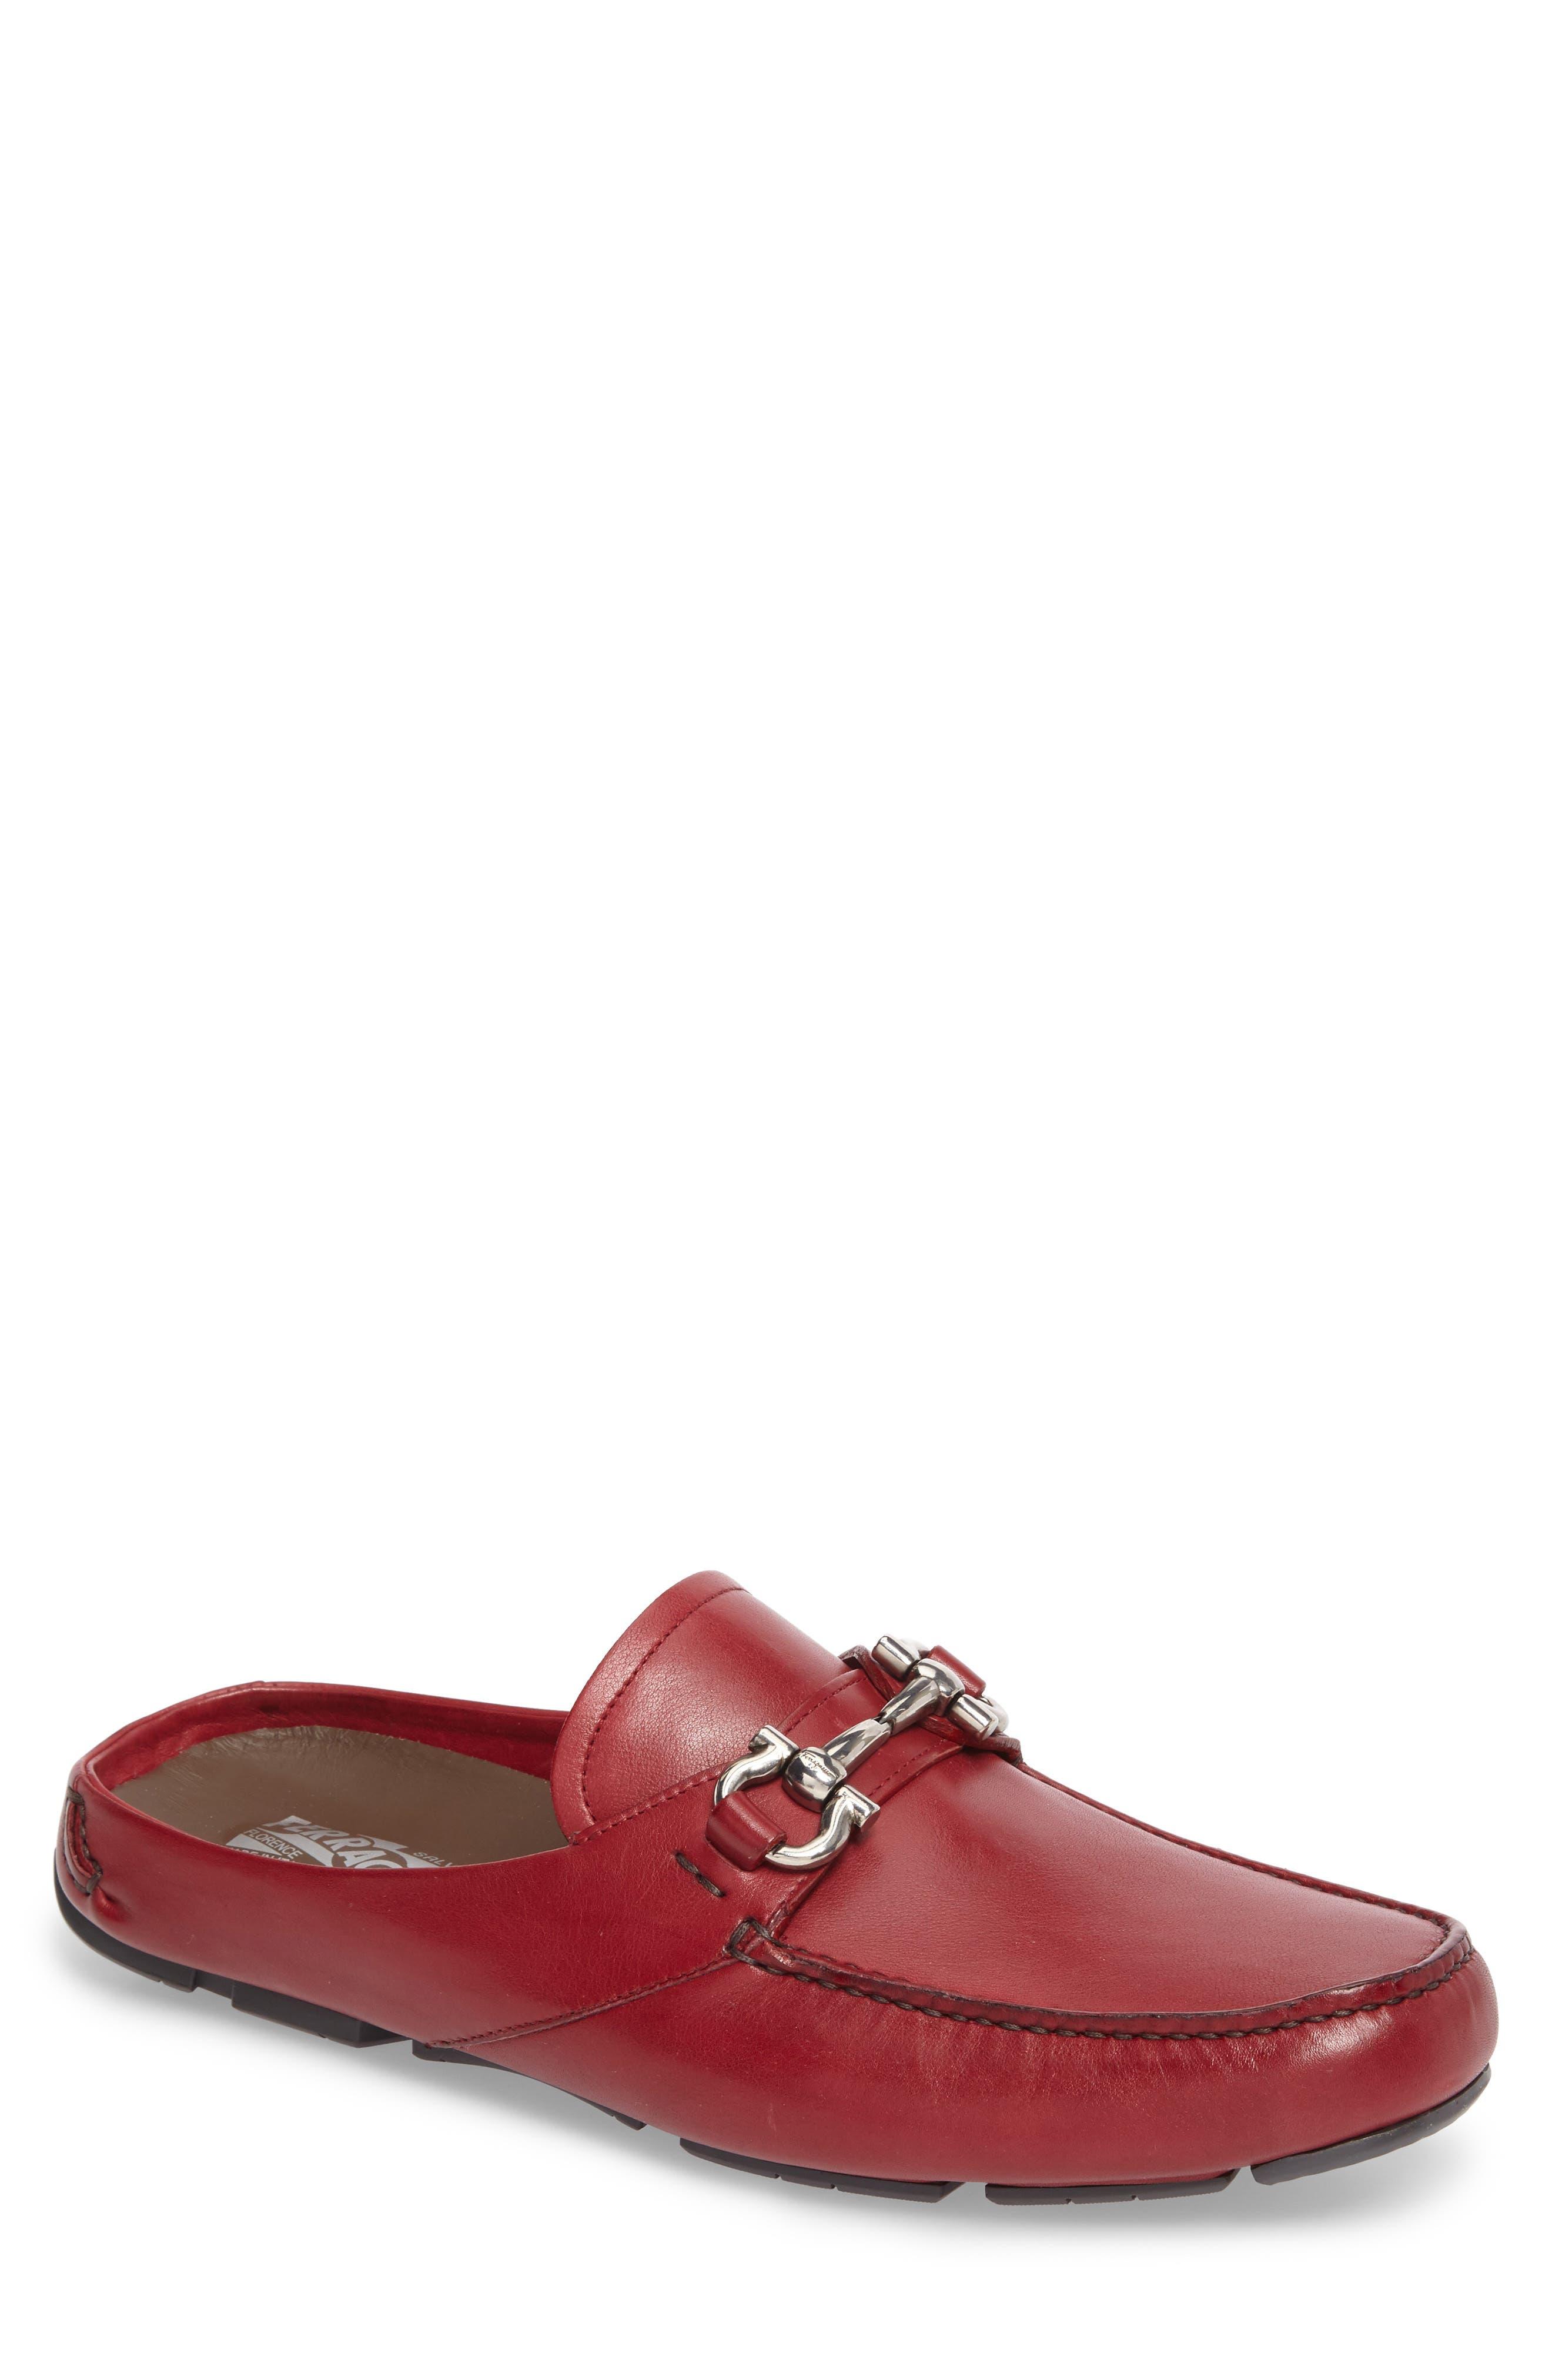 Mens Dress Shoes Ferragamo Salvatore Antoane Formal Loafer Dress Shoes Dress Shoes No taxes